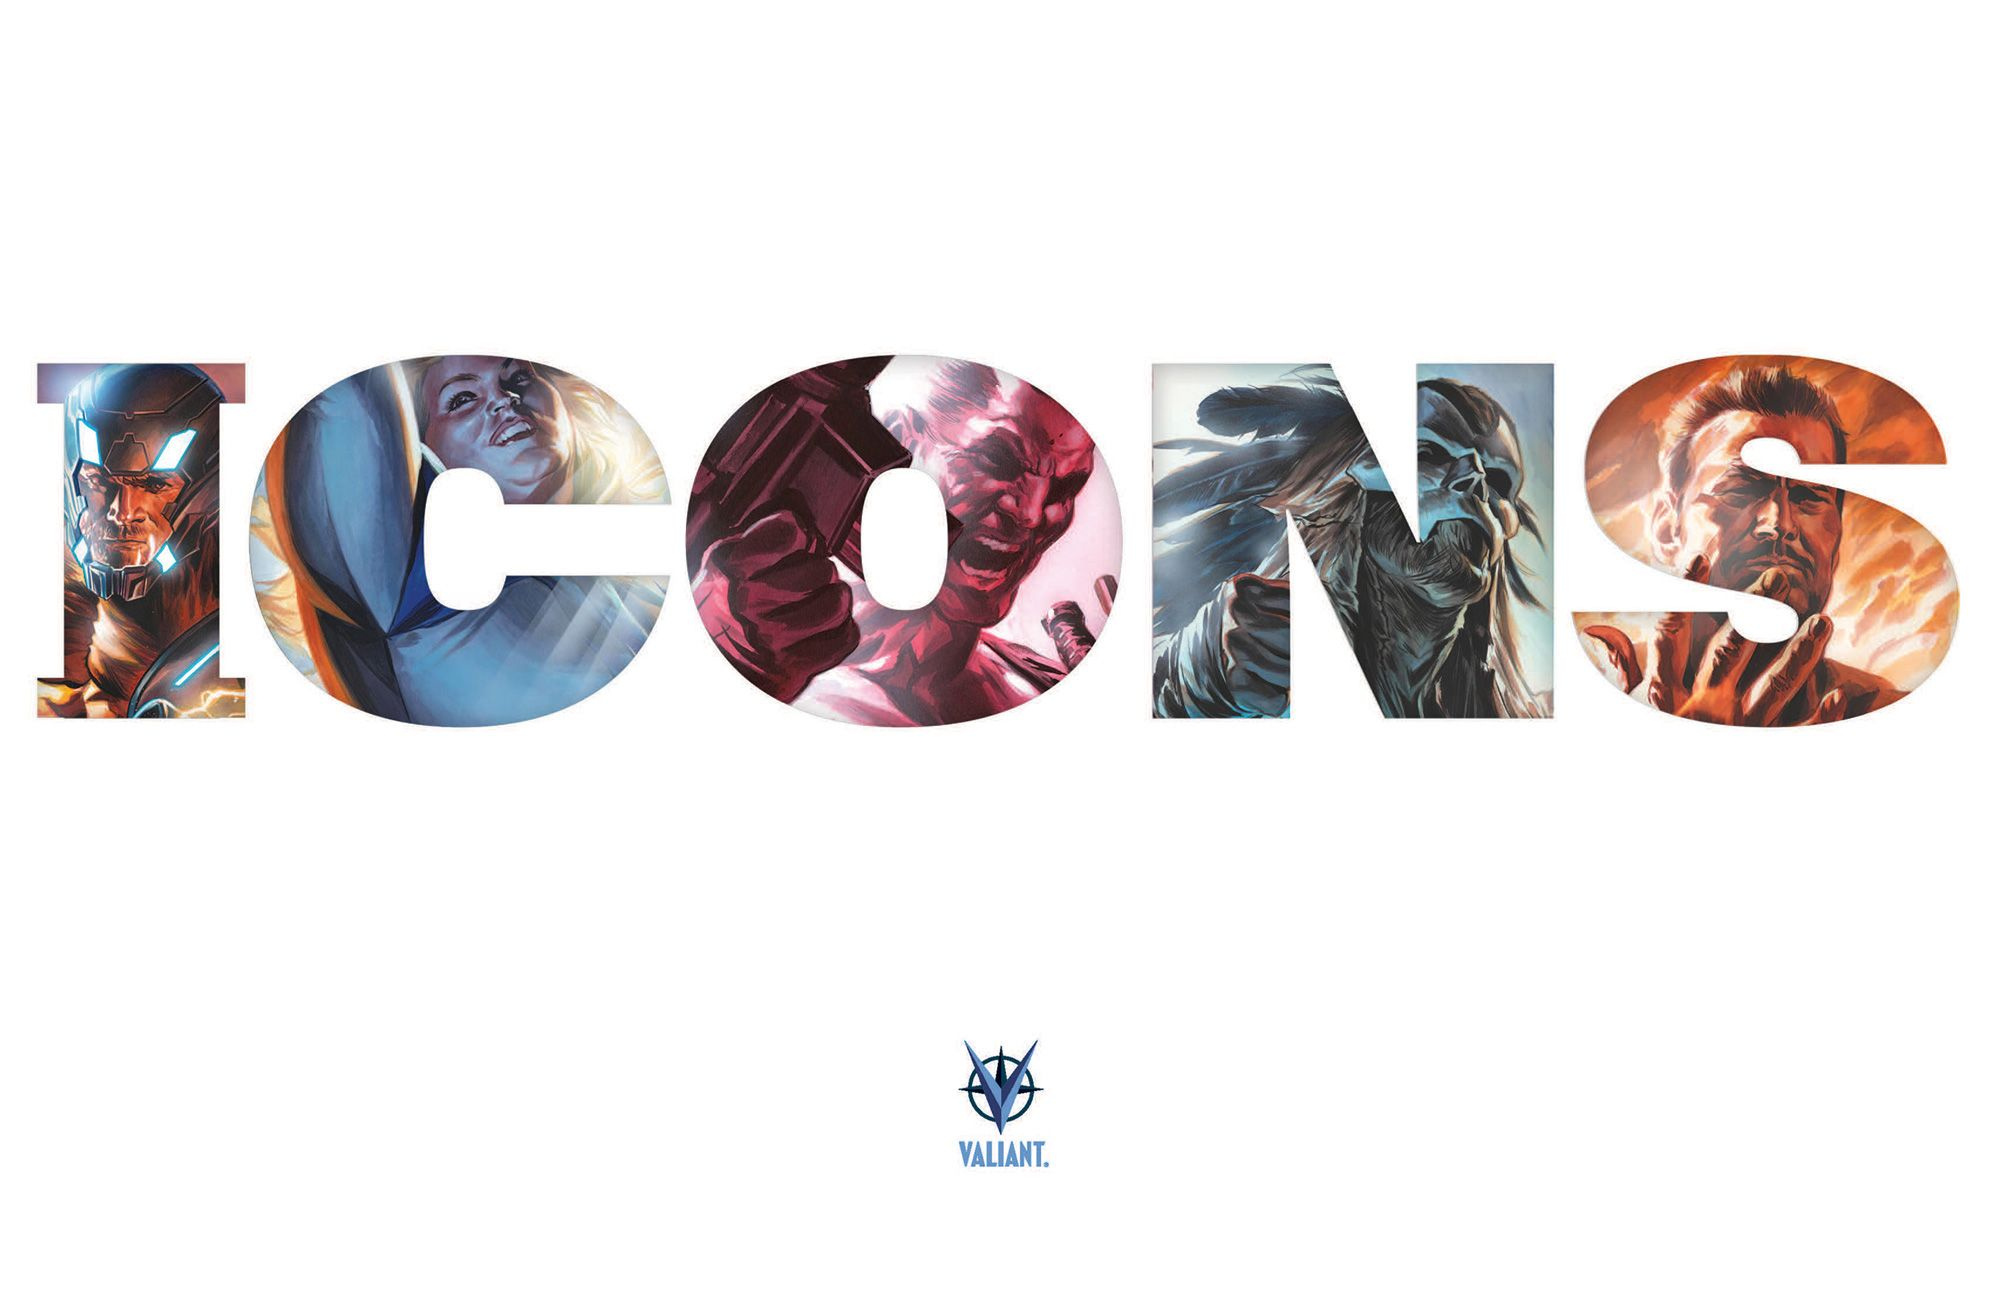 ICONS A NEW DAWN FOR VALIANT'S GREATEST HEROES X-O MANOWAR FAITH BLOODSHOT SHADOWMAN HARBINGER WARS 2 BEGINNING IN 2017 — Teaser Artwork by Felipe Massafera For more information, visit ValiantonFacebook,Twitter,Tumblr,Instagram, andValiantUniverse.com. For Valiant merchandise... Bloodshot, Faith, Felipe Massafera, harbinger wars 2, Icons, Shadowman, Valiant, Valiant Entertainment, X-O Manowar